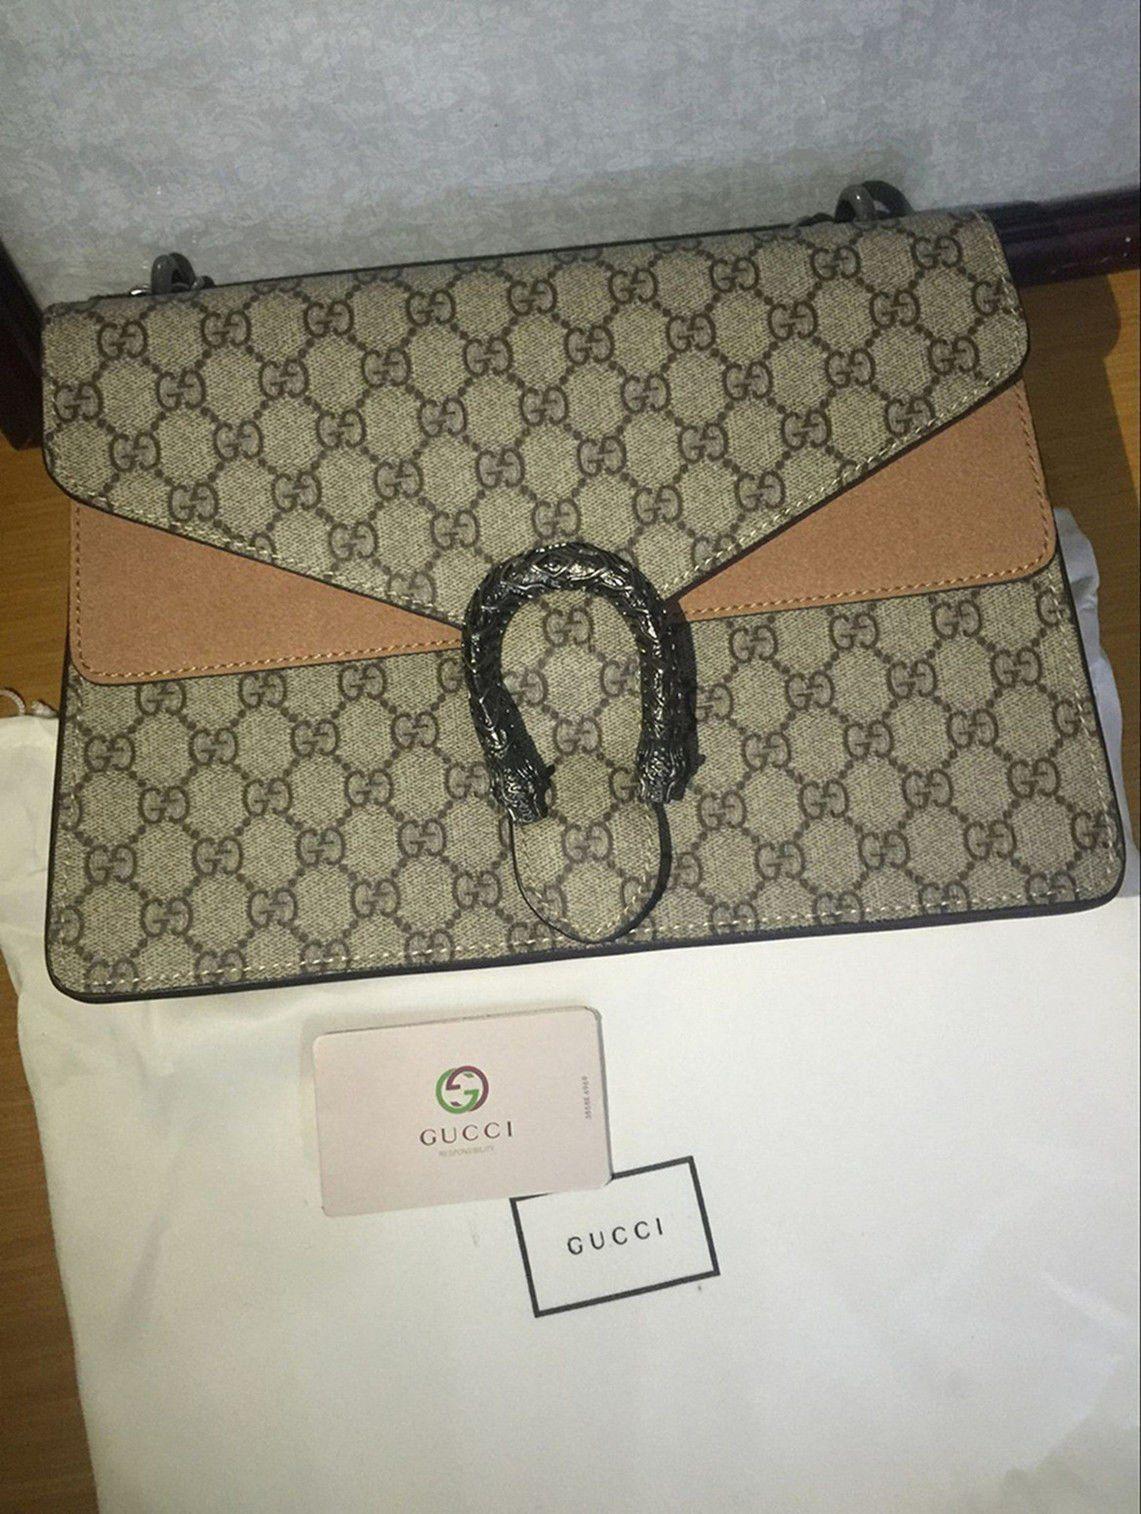 #Trending - AUTHENTIC Gucci-Dionysus GG Supreme Medium Shoulder Bag https://t.co/p9LaG7feSP Ebay https://t.co/bgy3hwxqjk